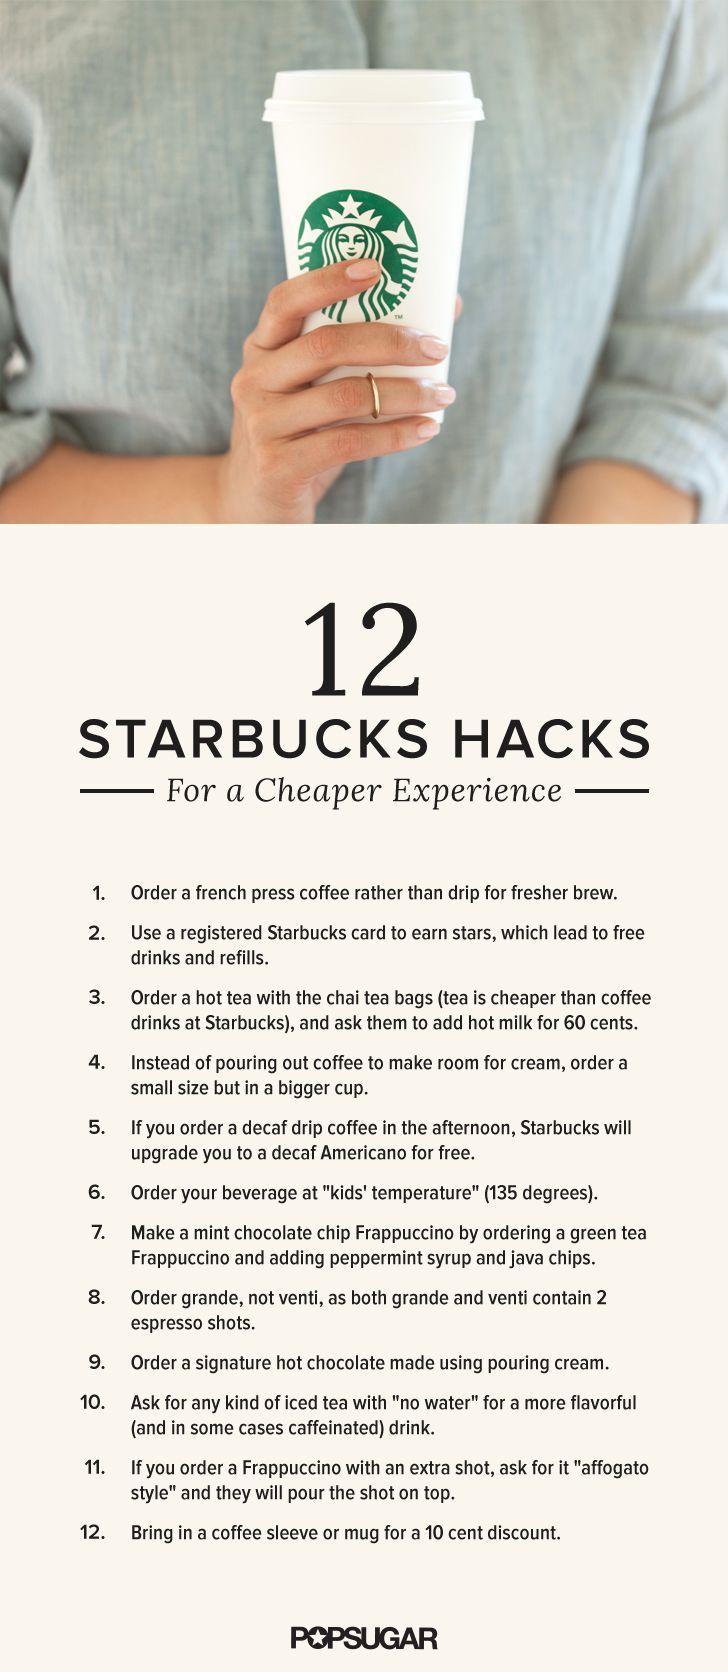 Best 25+ Starbucks Hacks Ideas On Pinterest  Secret Starbucks Drinks, Life  Hacks Music And Starbucks Secret Menu Fraps